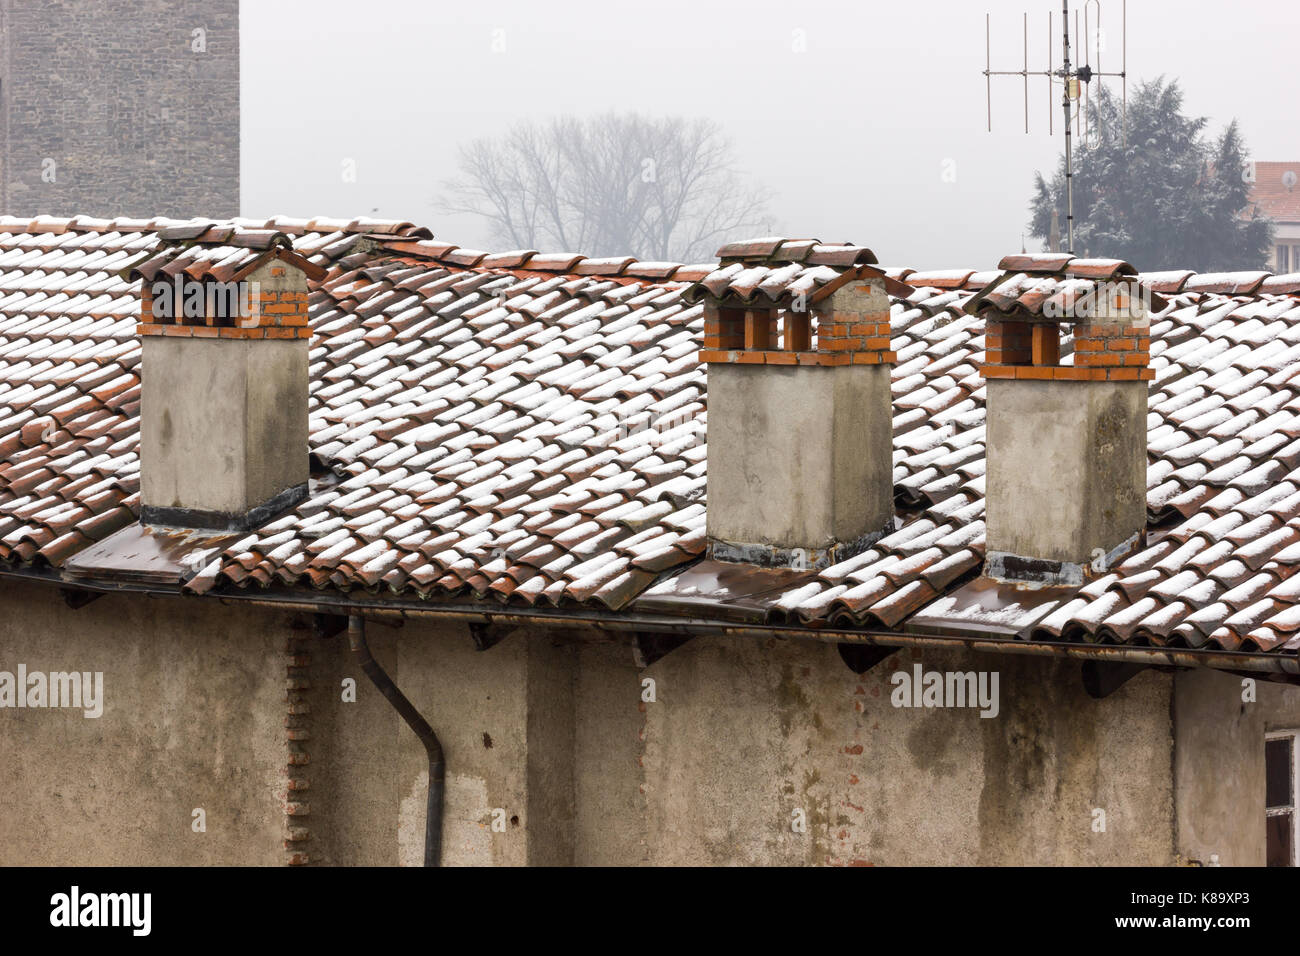 brick chimney roof tiles stock photos u0026 brick chimney roof tiles